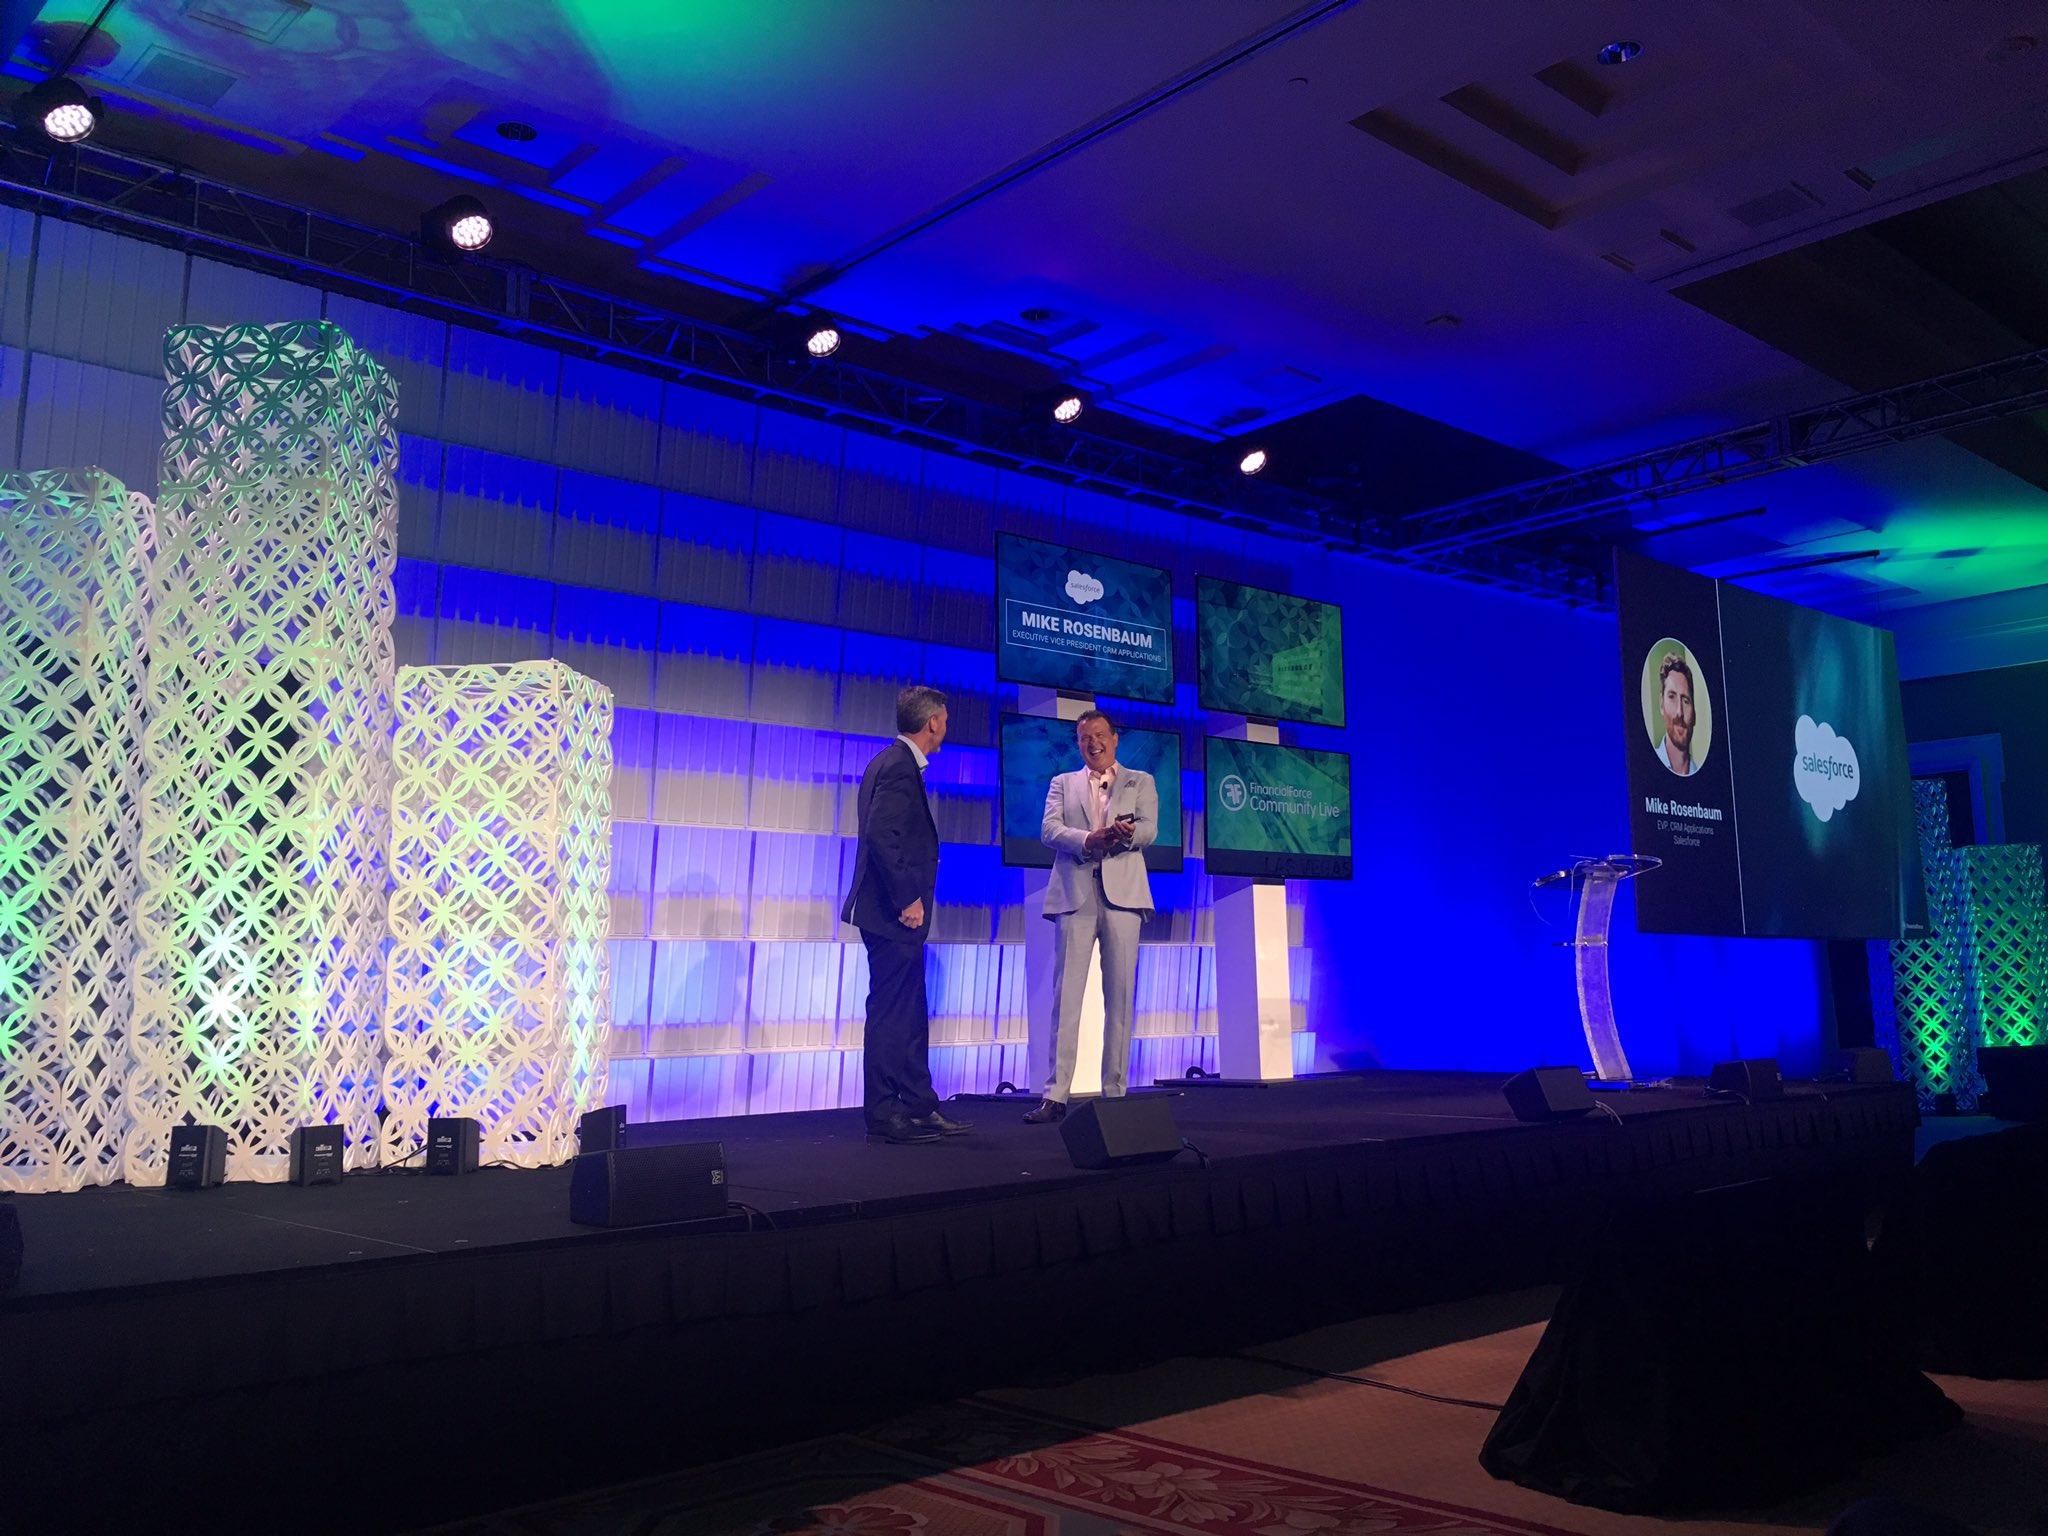 Mike Rosenbaum, EVP CRM Applications @salesforce, joins Tod Nielsen on stage. #FFComm17 https://t.co/E8sC8R0oNJ